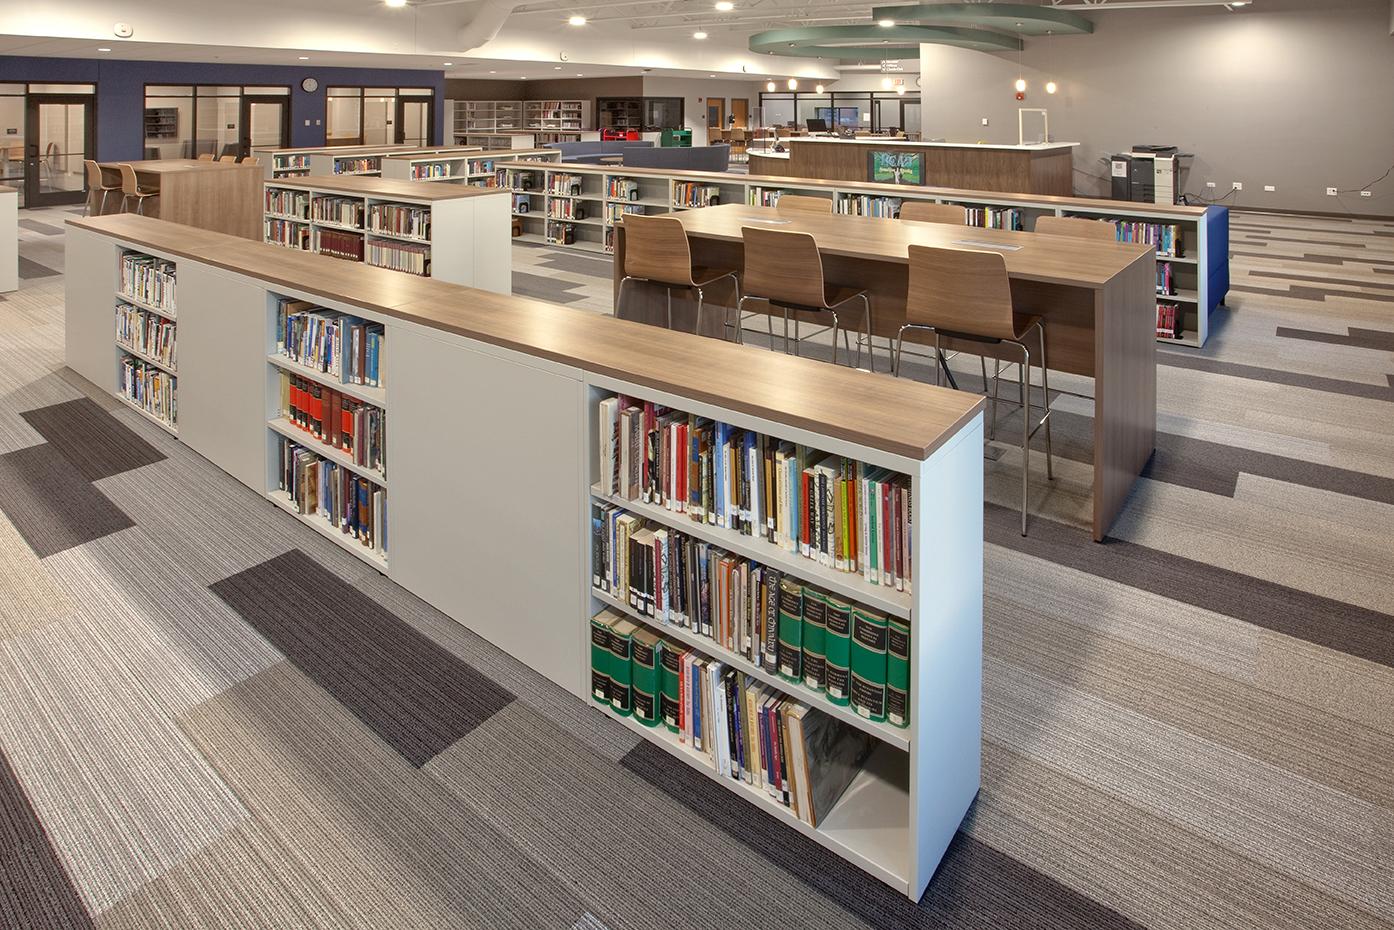 benet-academy-library-4-lo